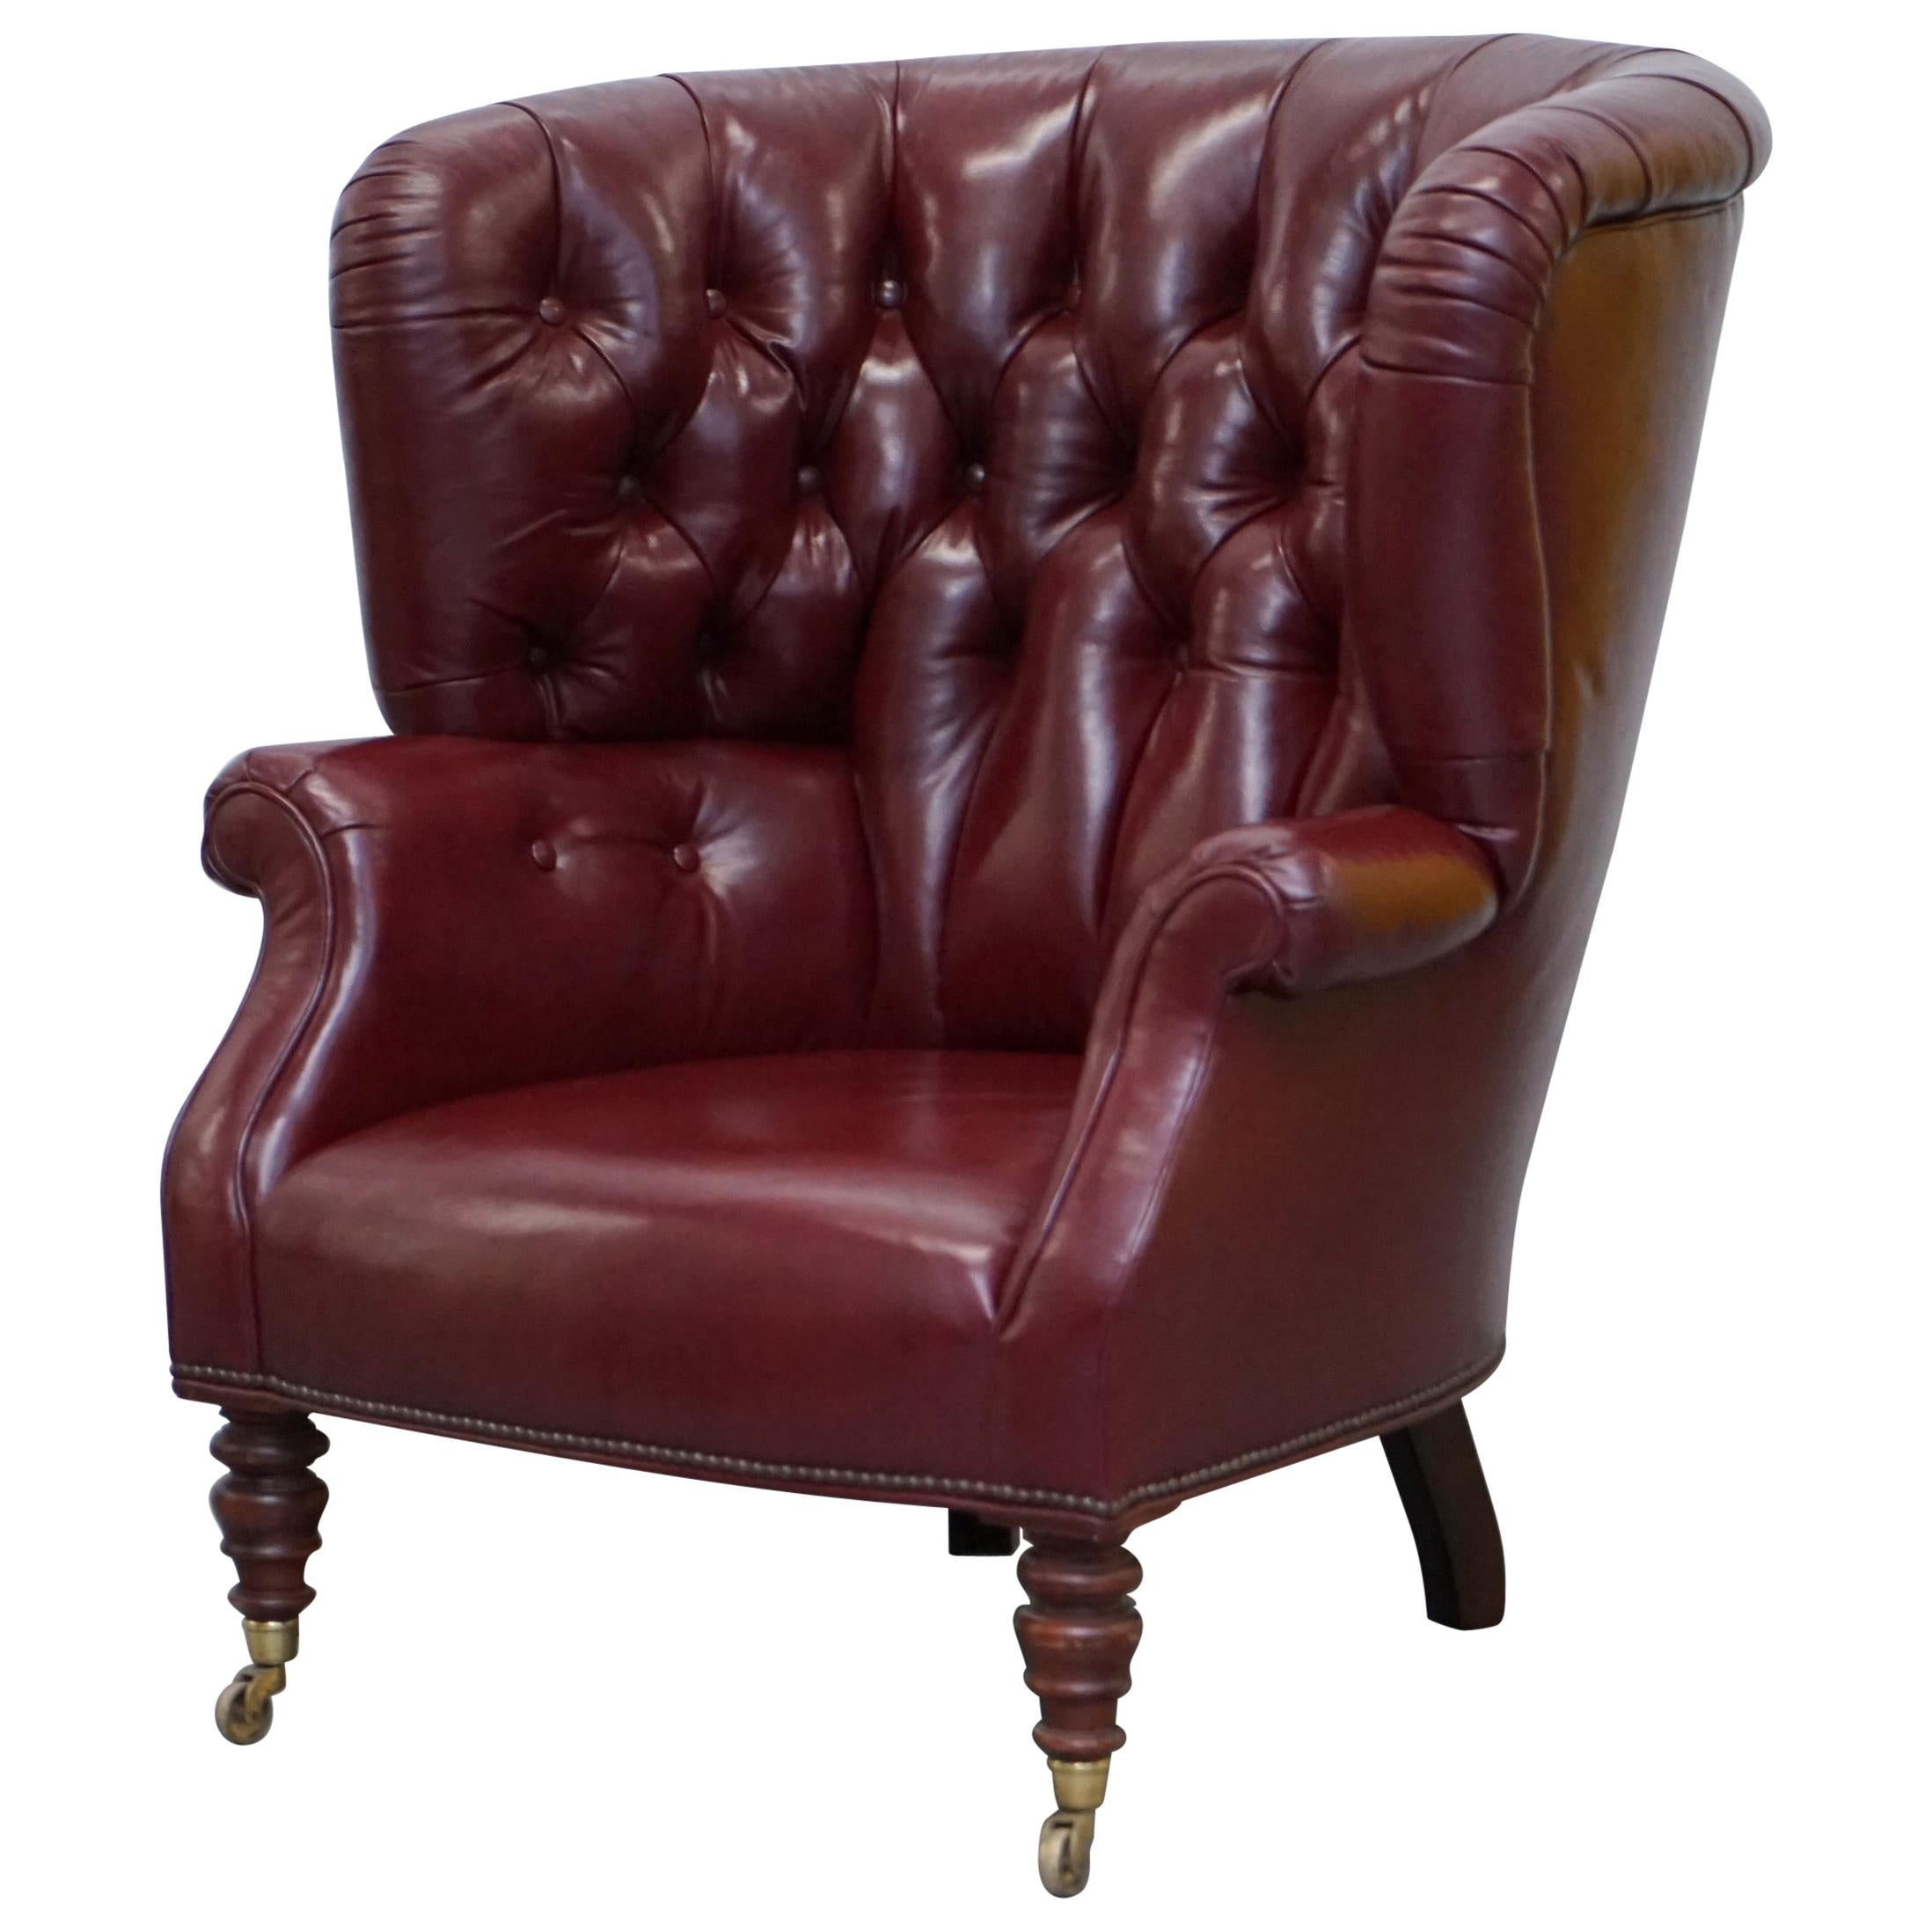 Oxblood Leather Baker Furniture Chesterfield Porters Barrel Armchair